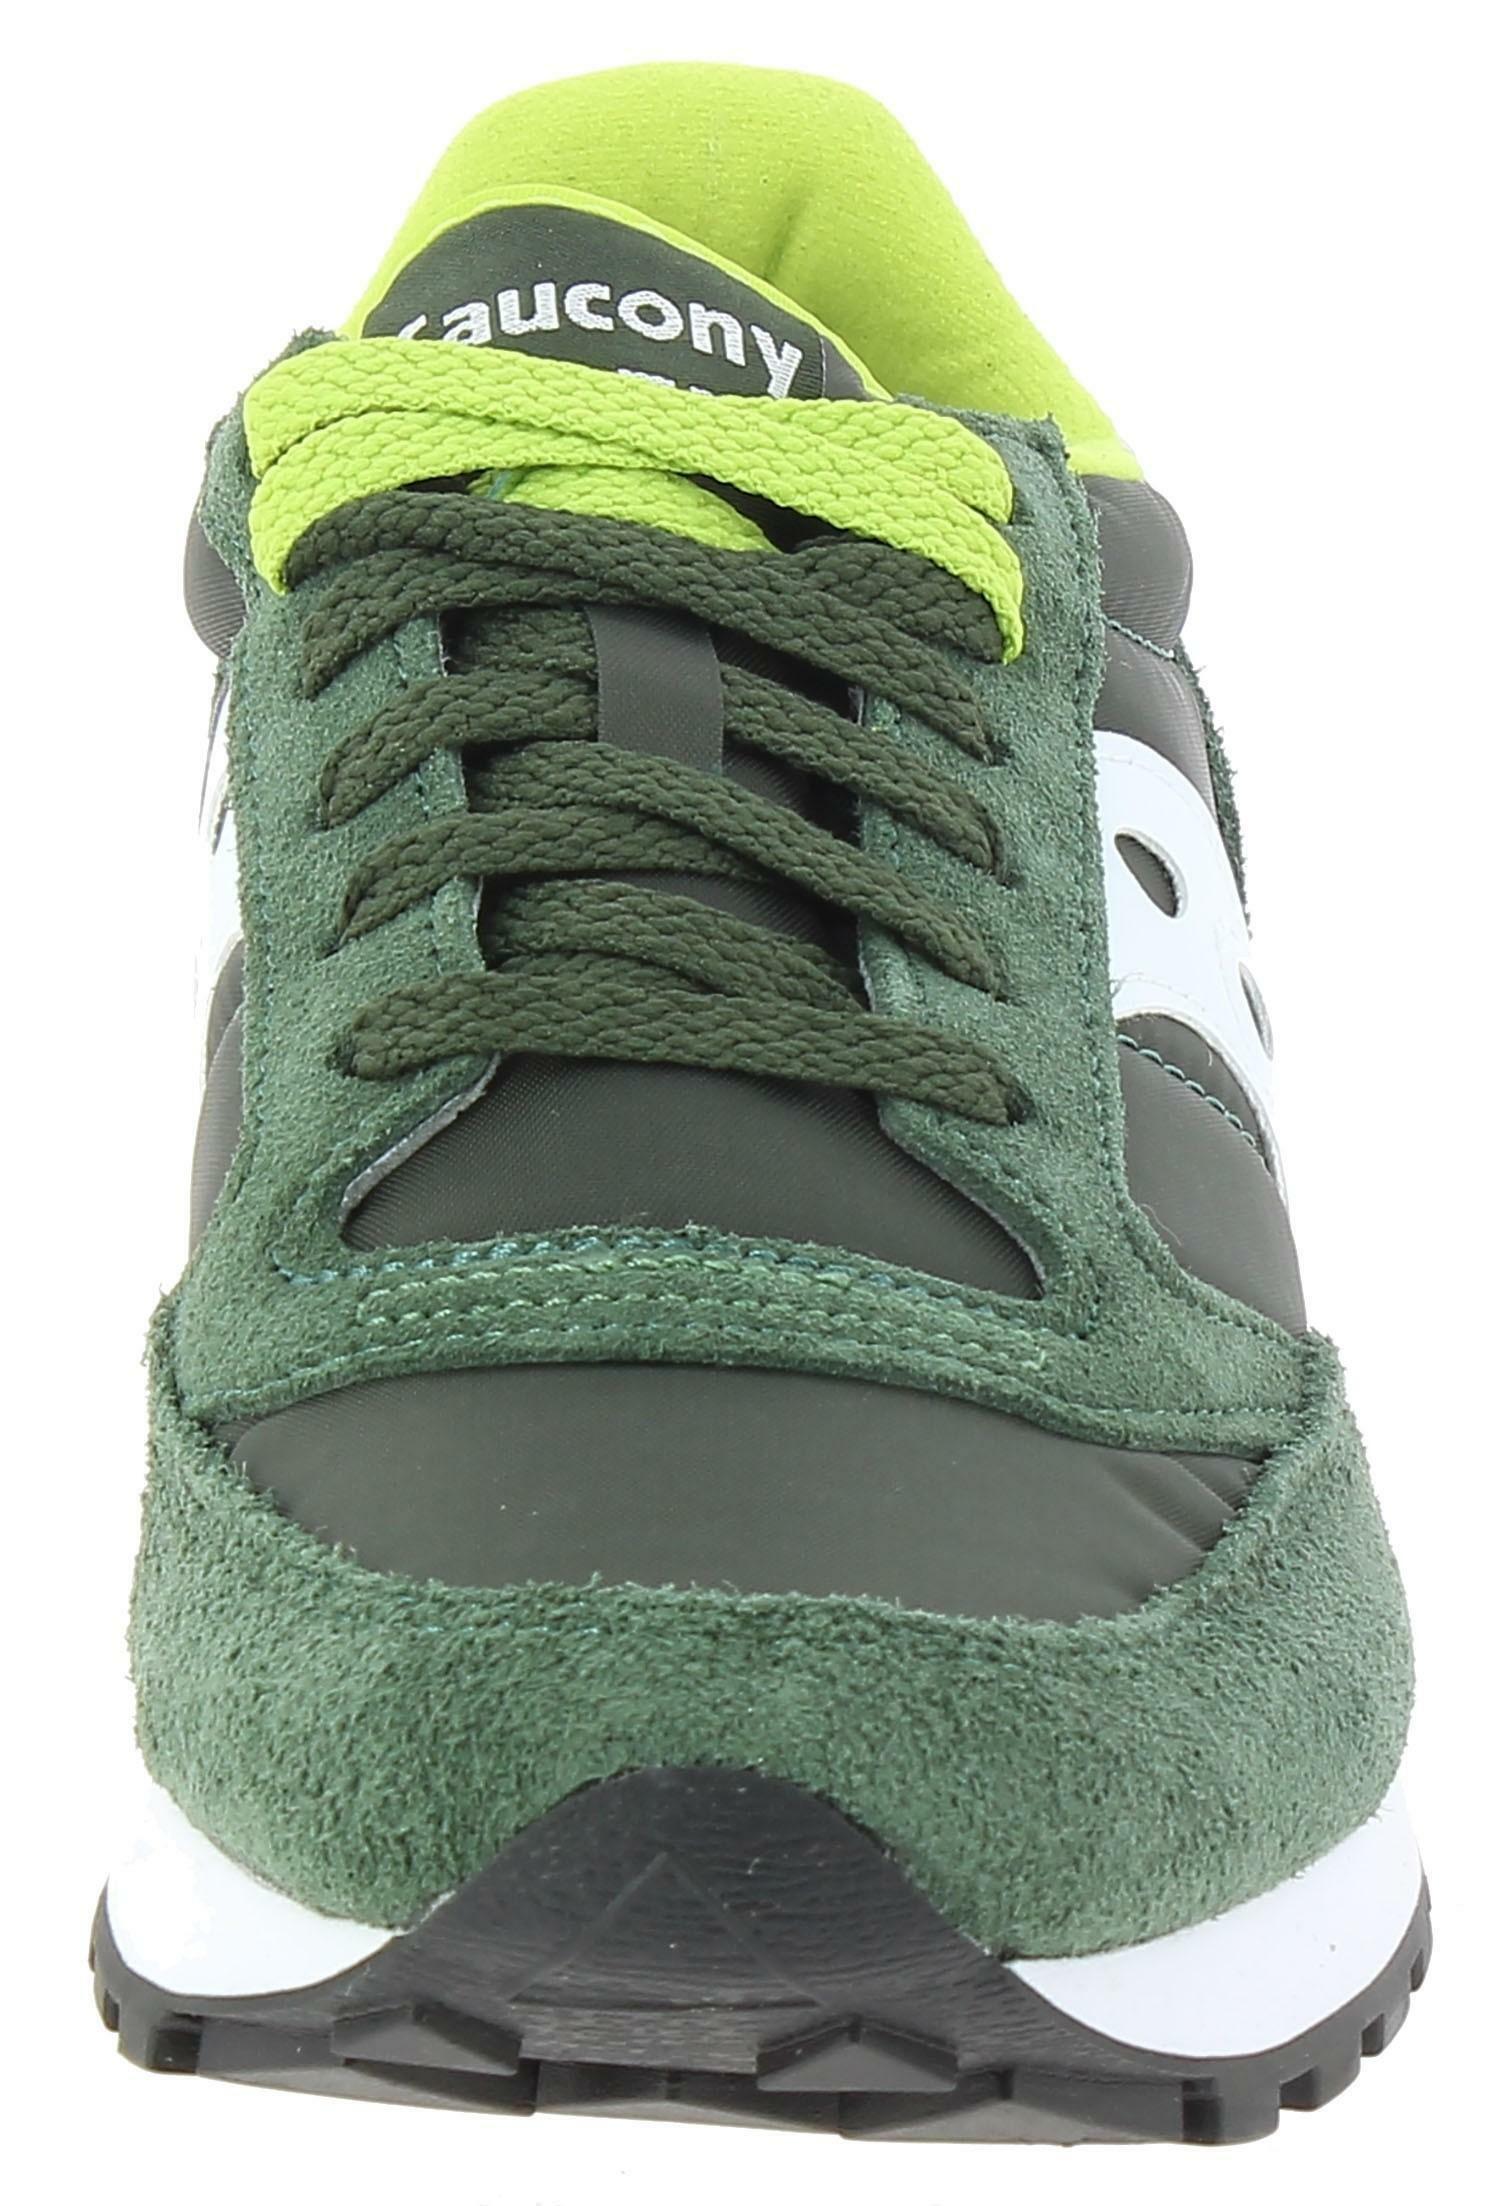 saucony saucony jazz original scarpe sportive uomo verdi 2044275